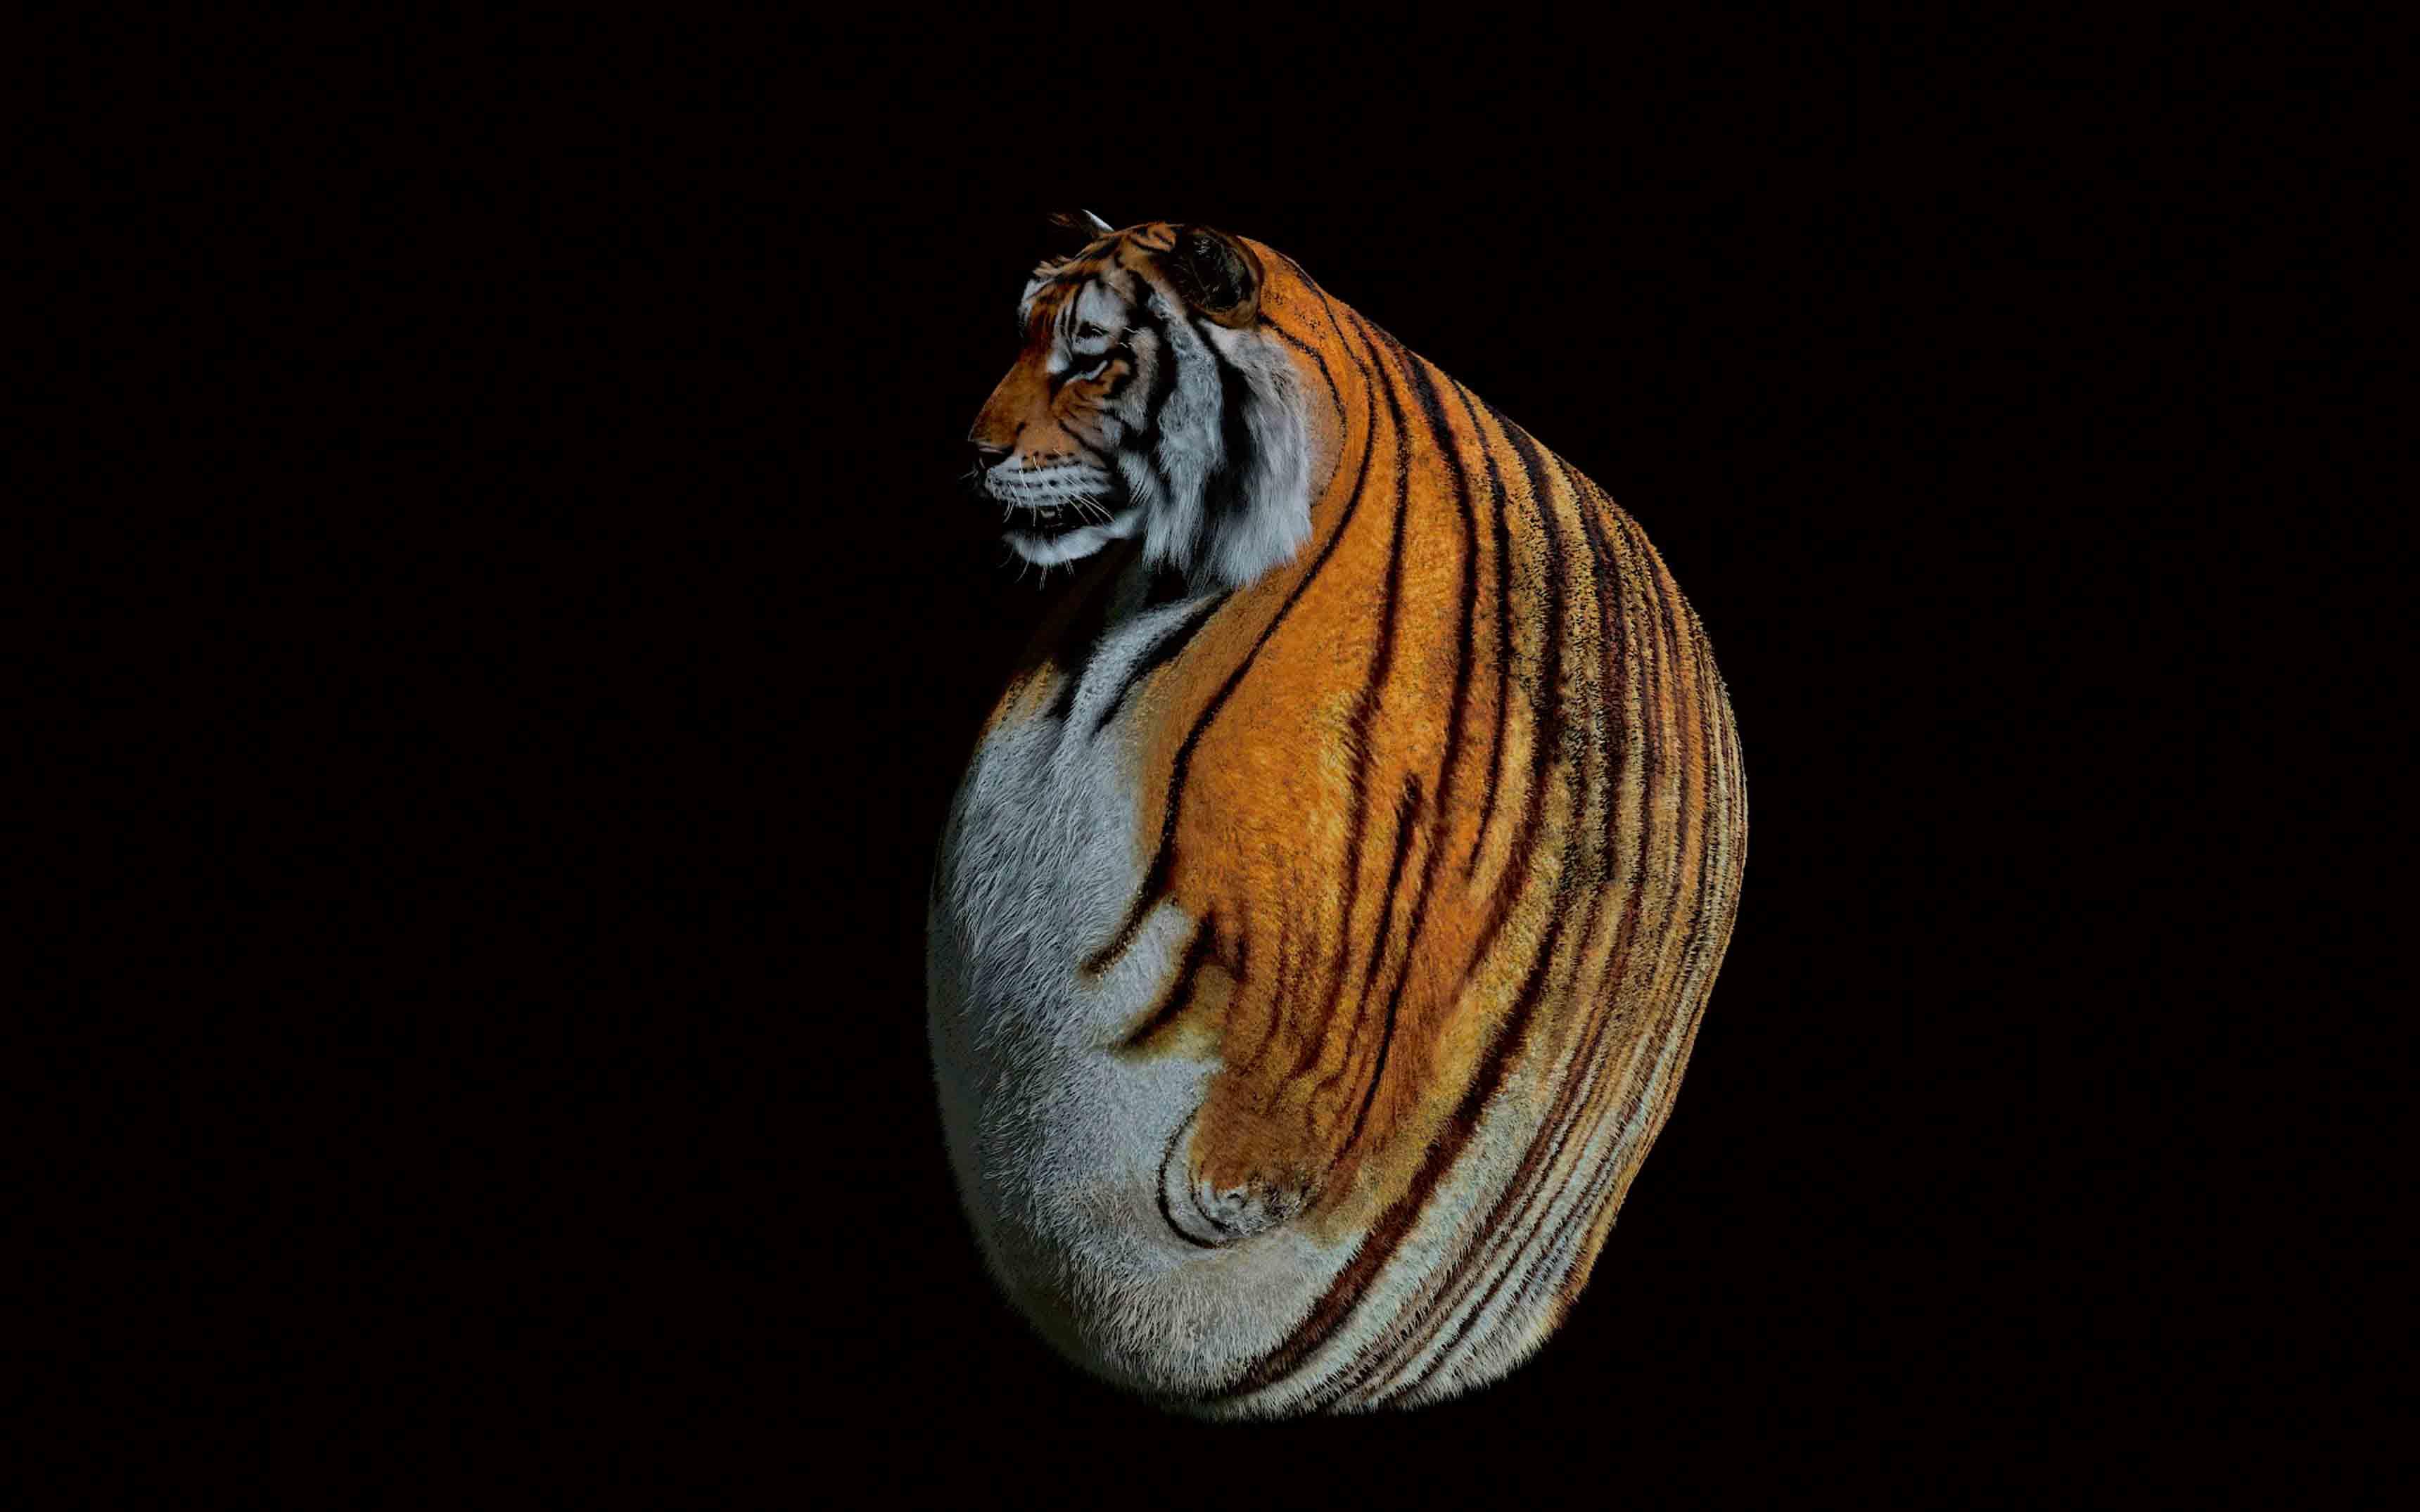 """2 or 3 tigers"", Tzu Nyen Ho, 2015"